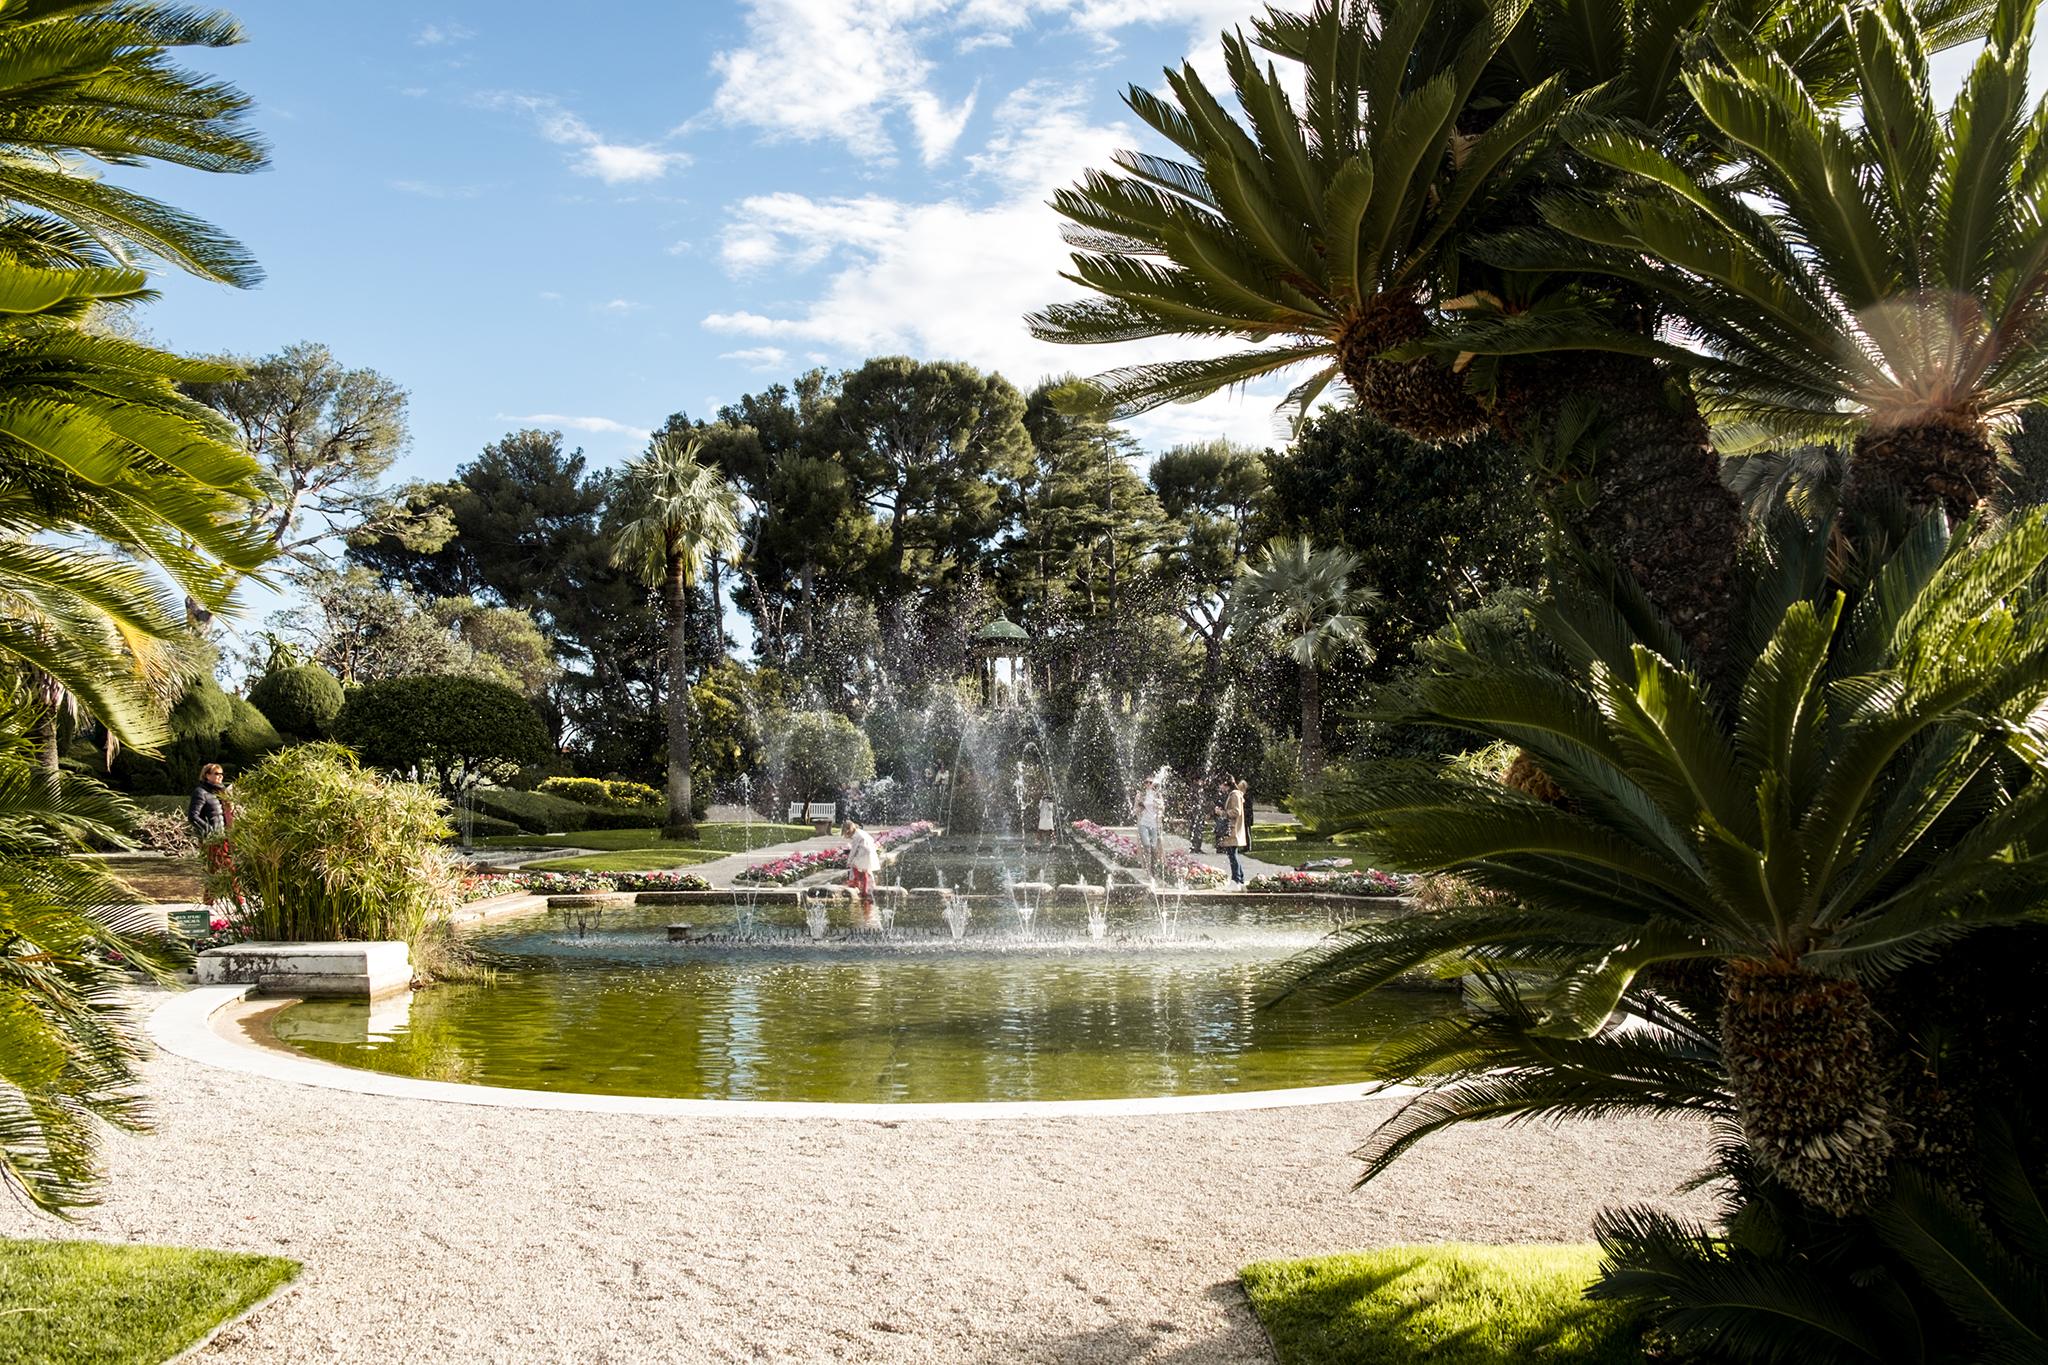 Garten der Villa Rothschild Saint-Jean Cap Ferrat Cote d'Azur